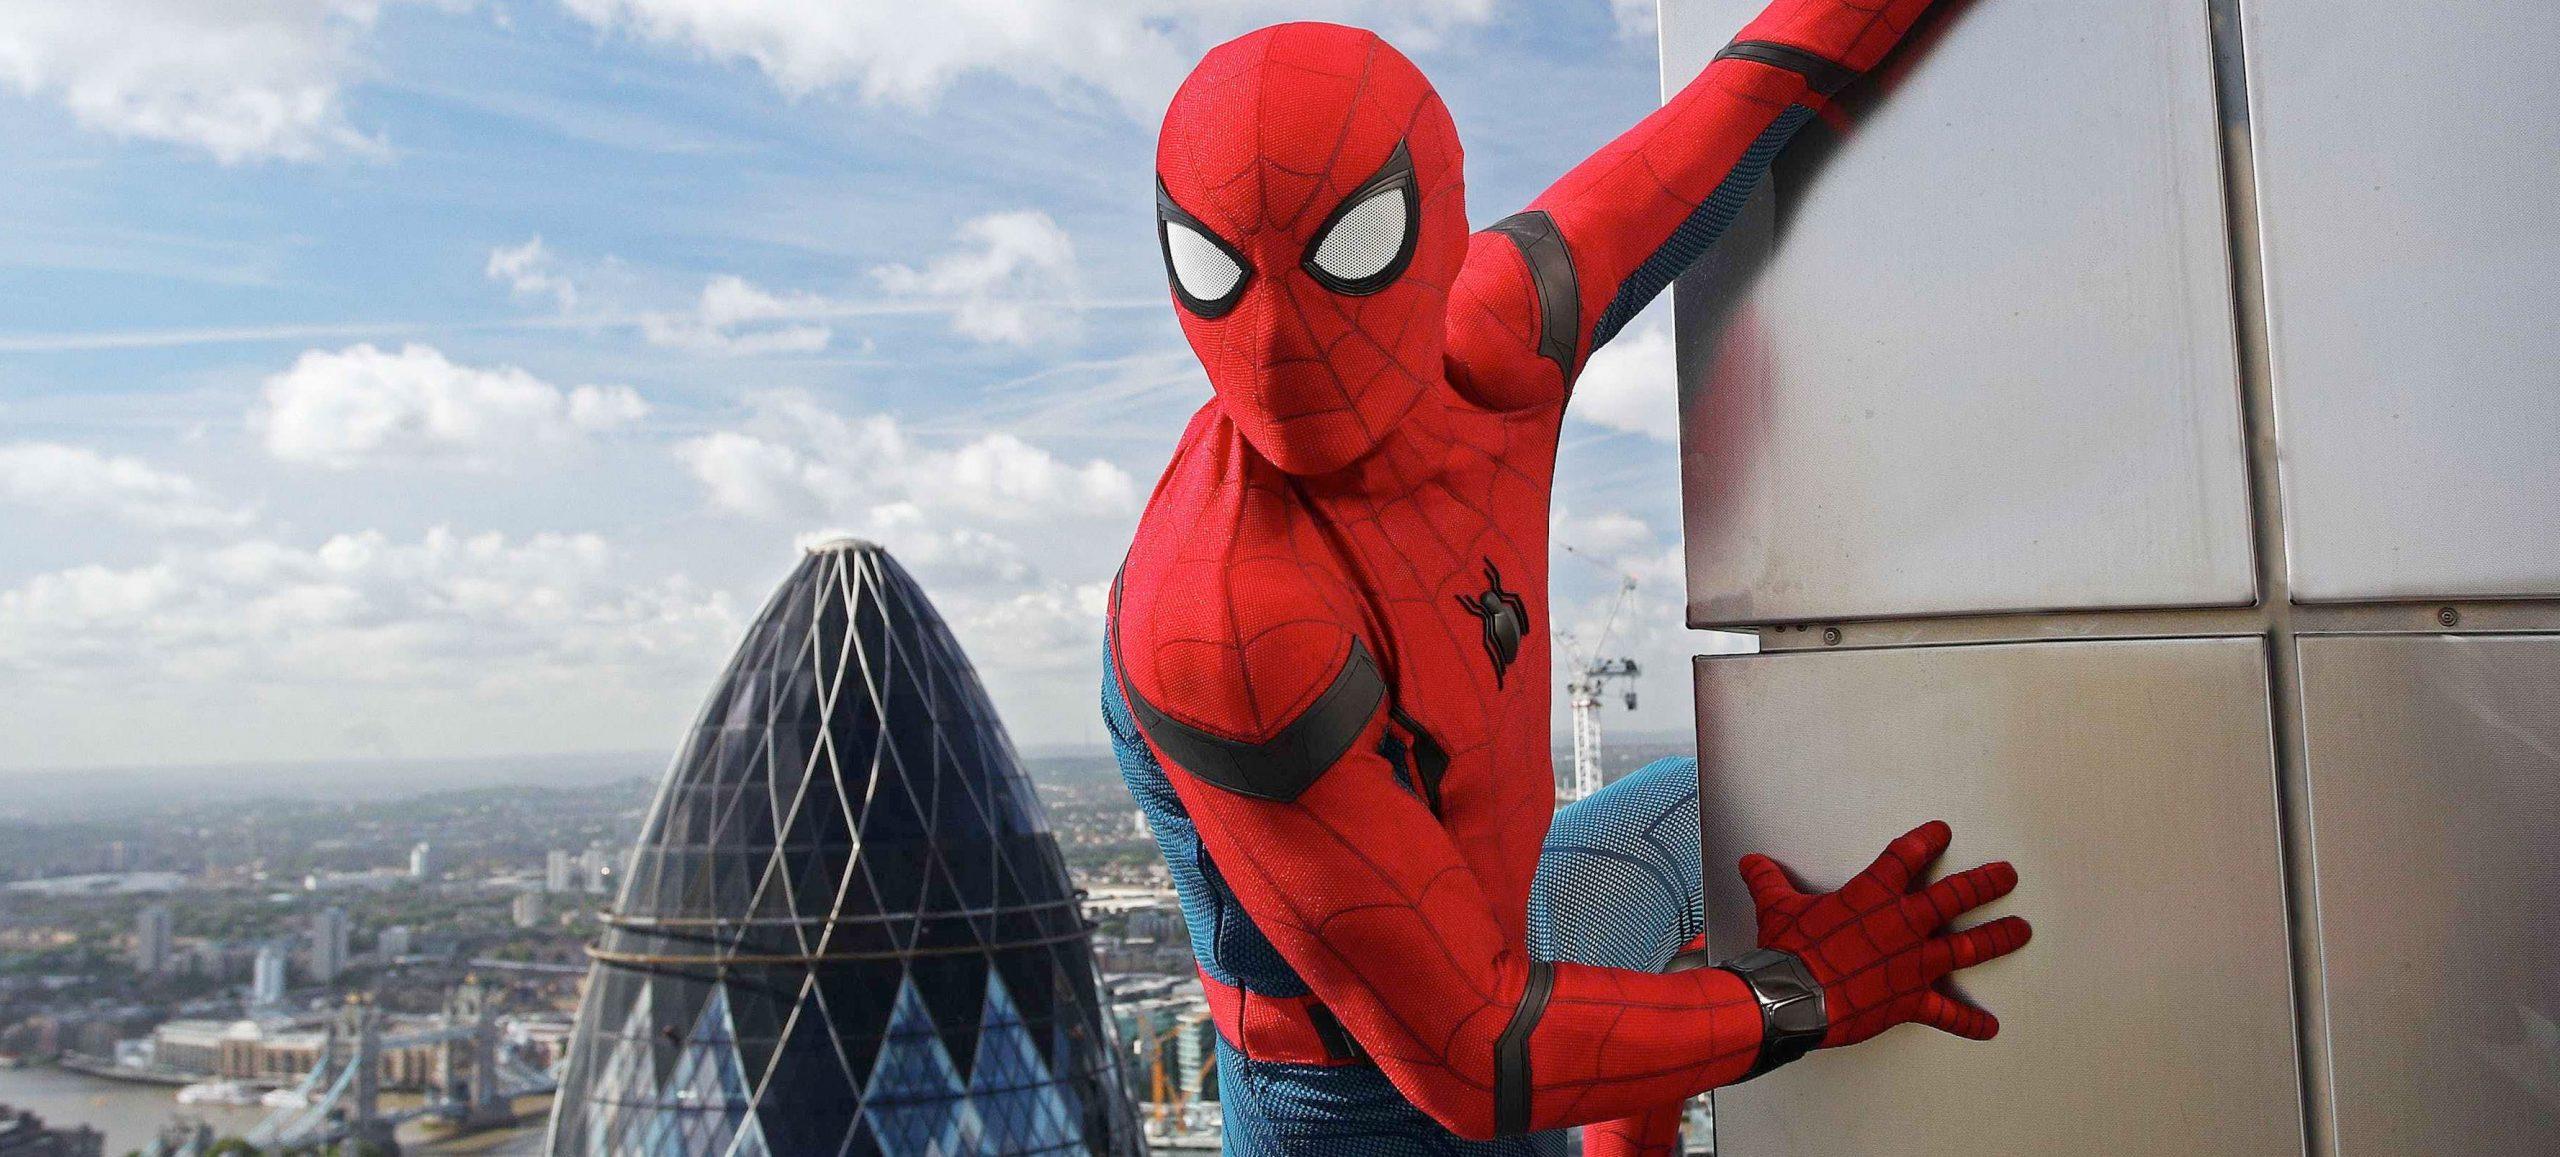 Spider-Man: Far From Home sequel Movie Scene